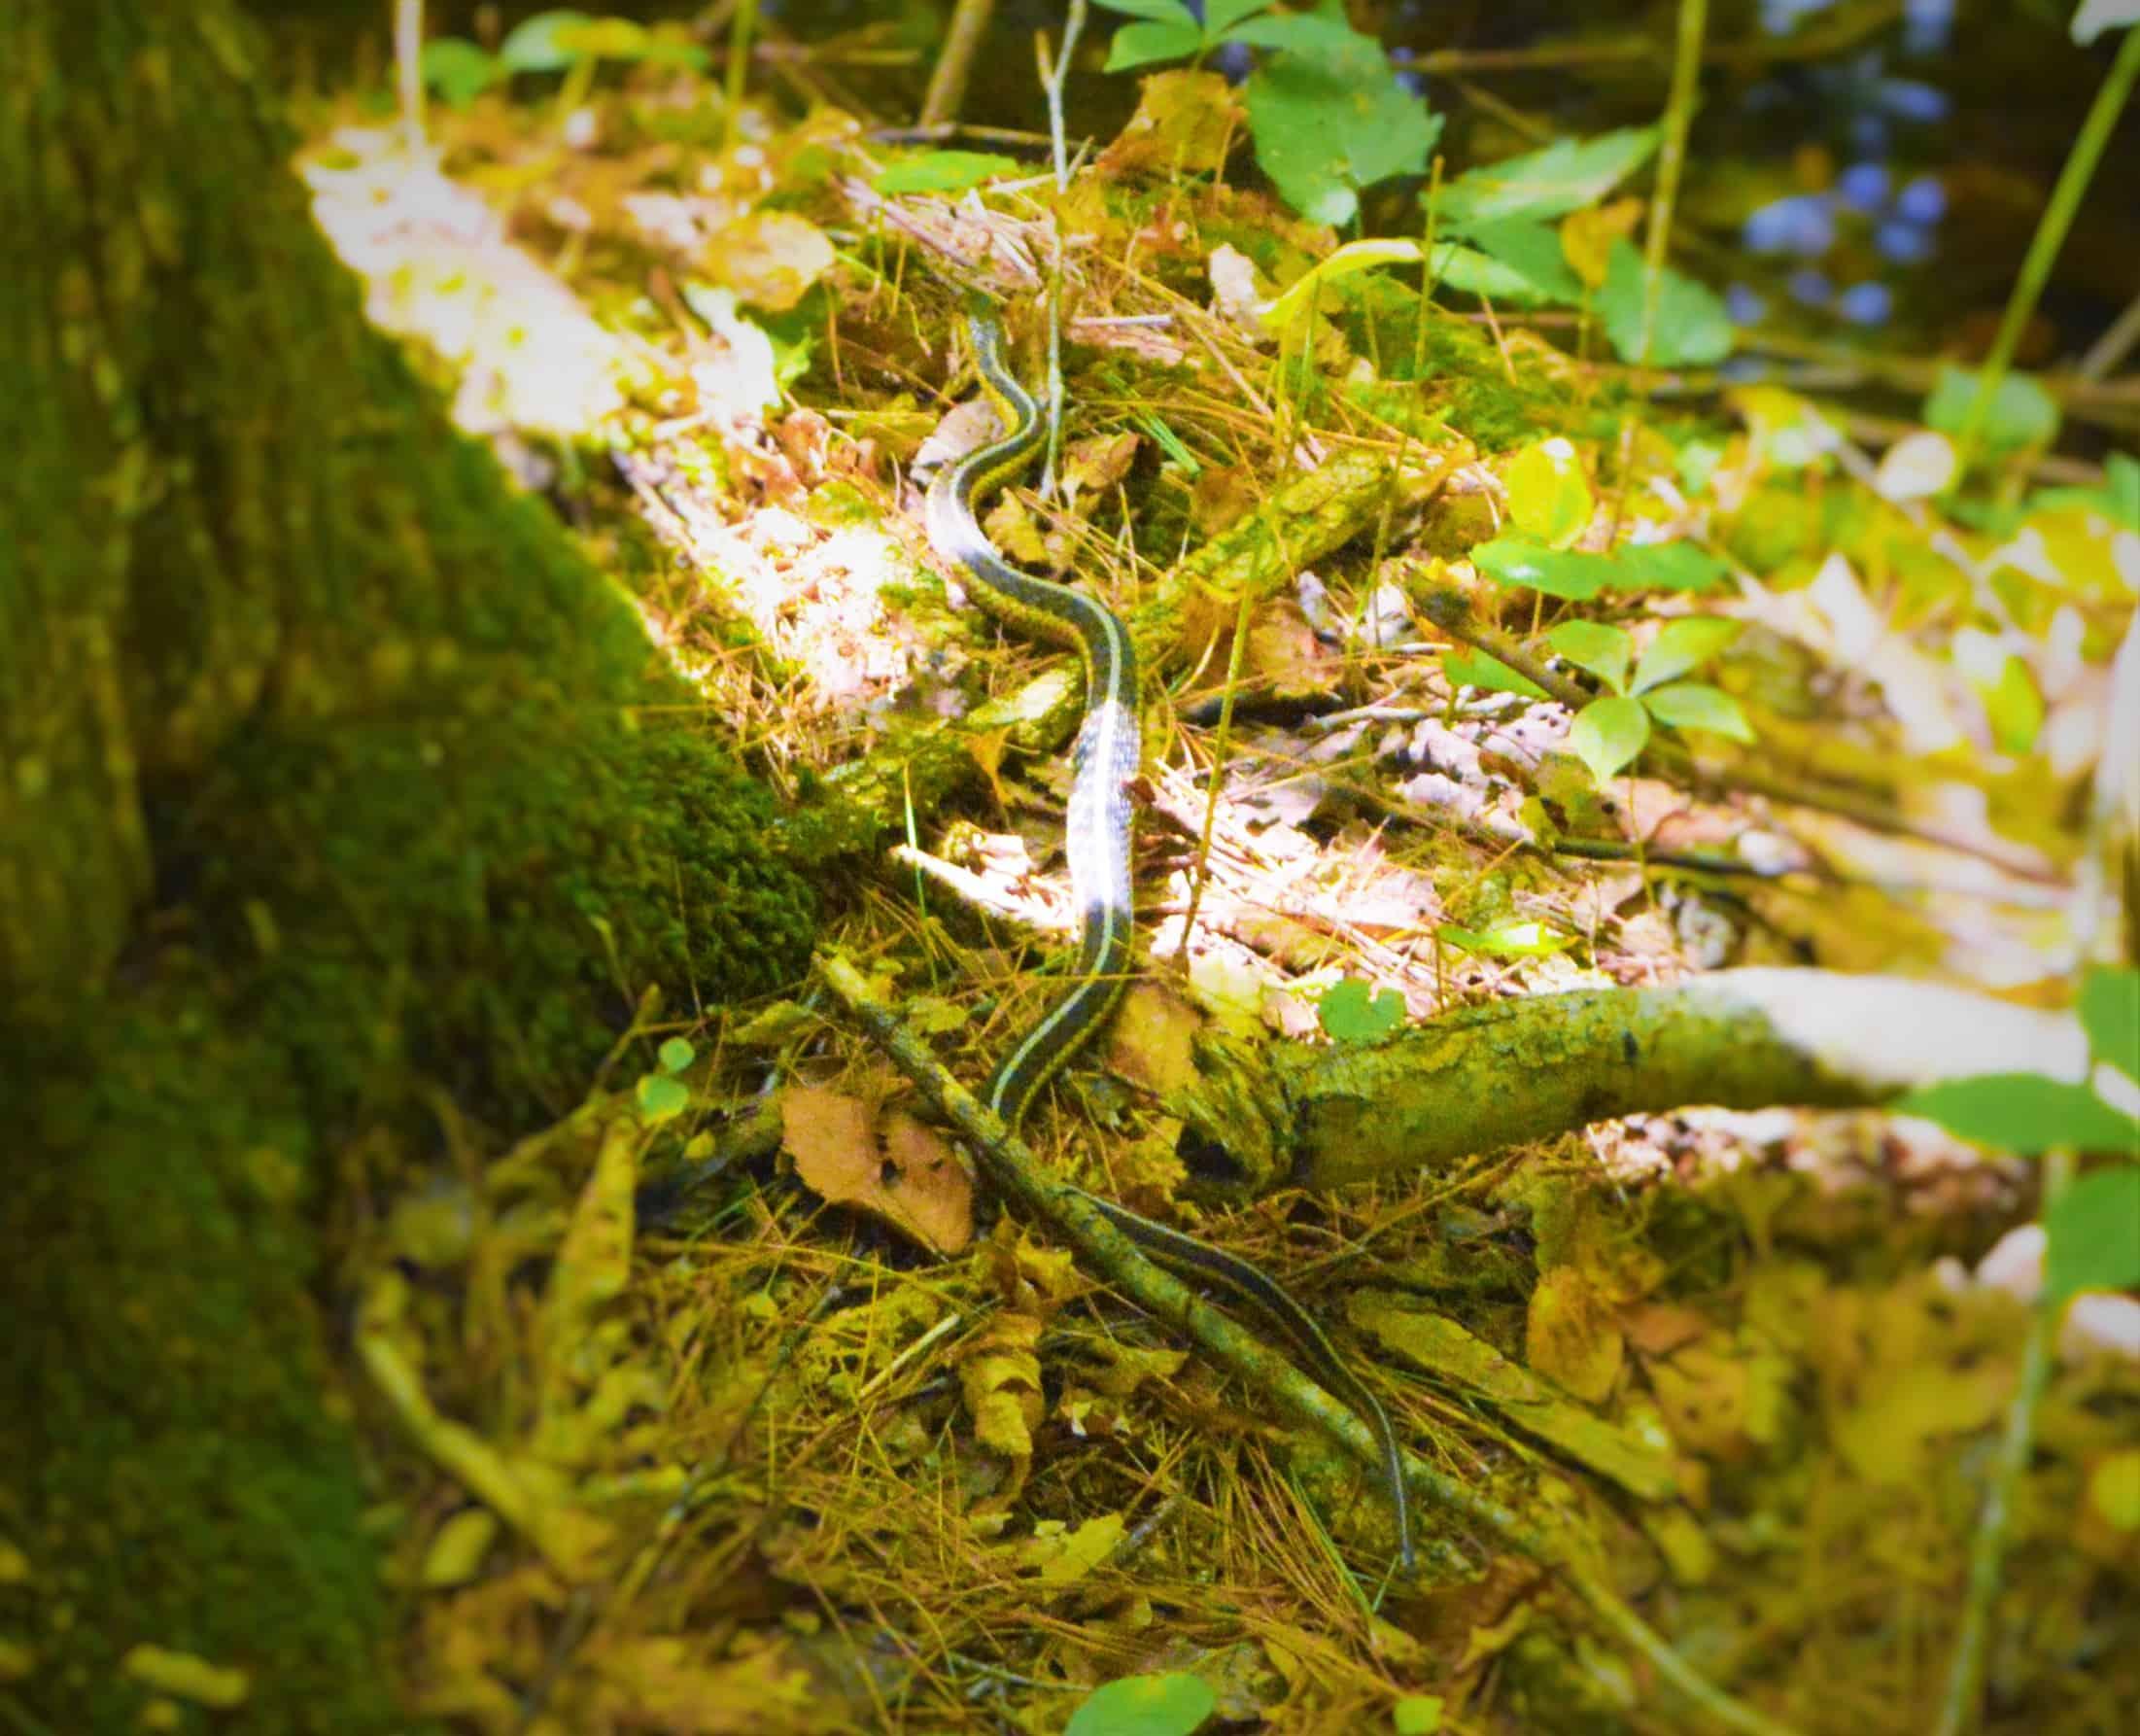 snake on rivers edge